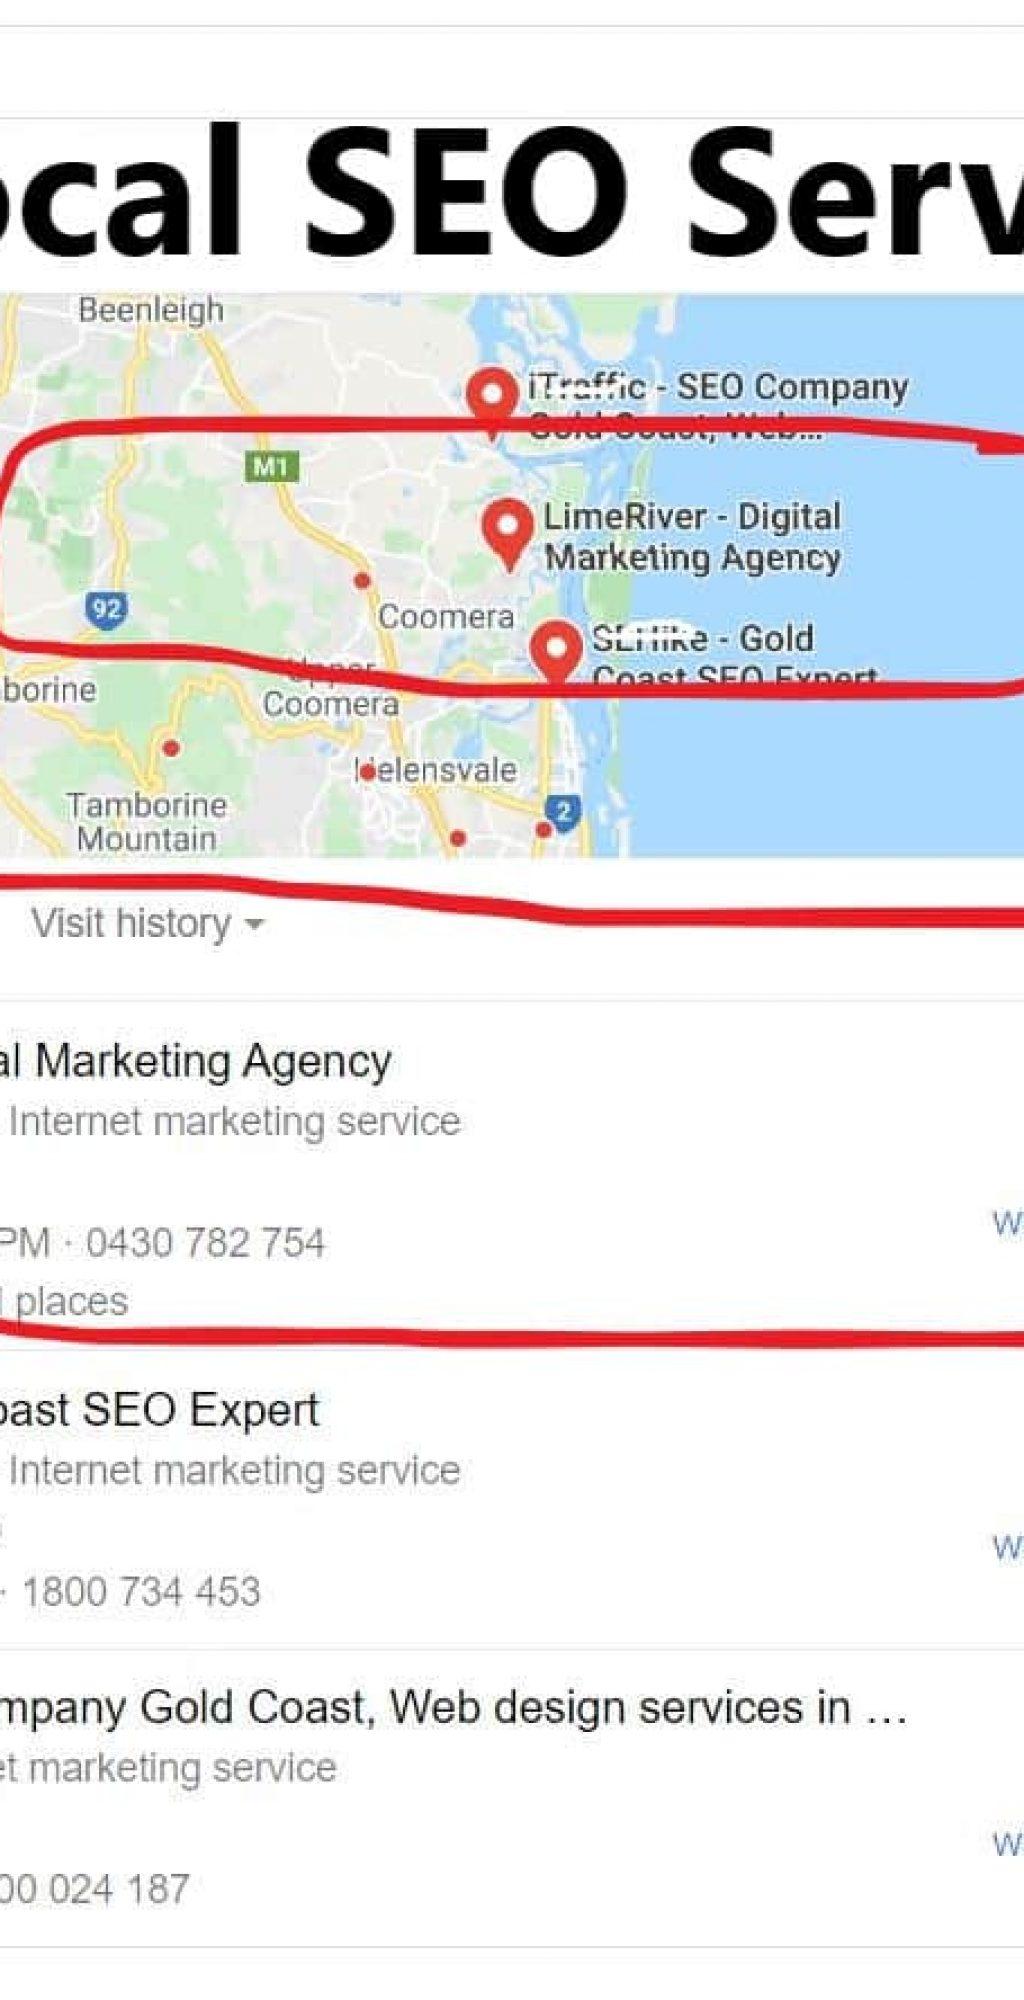 #1 Local SEO Services